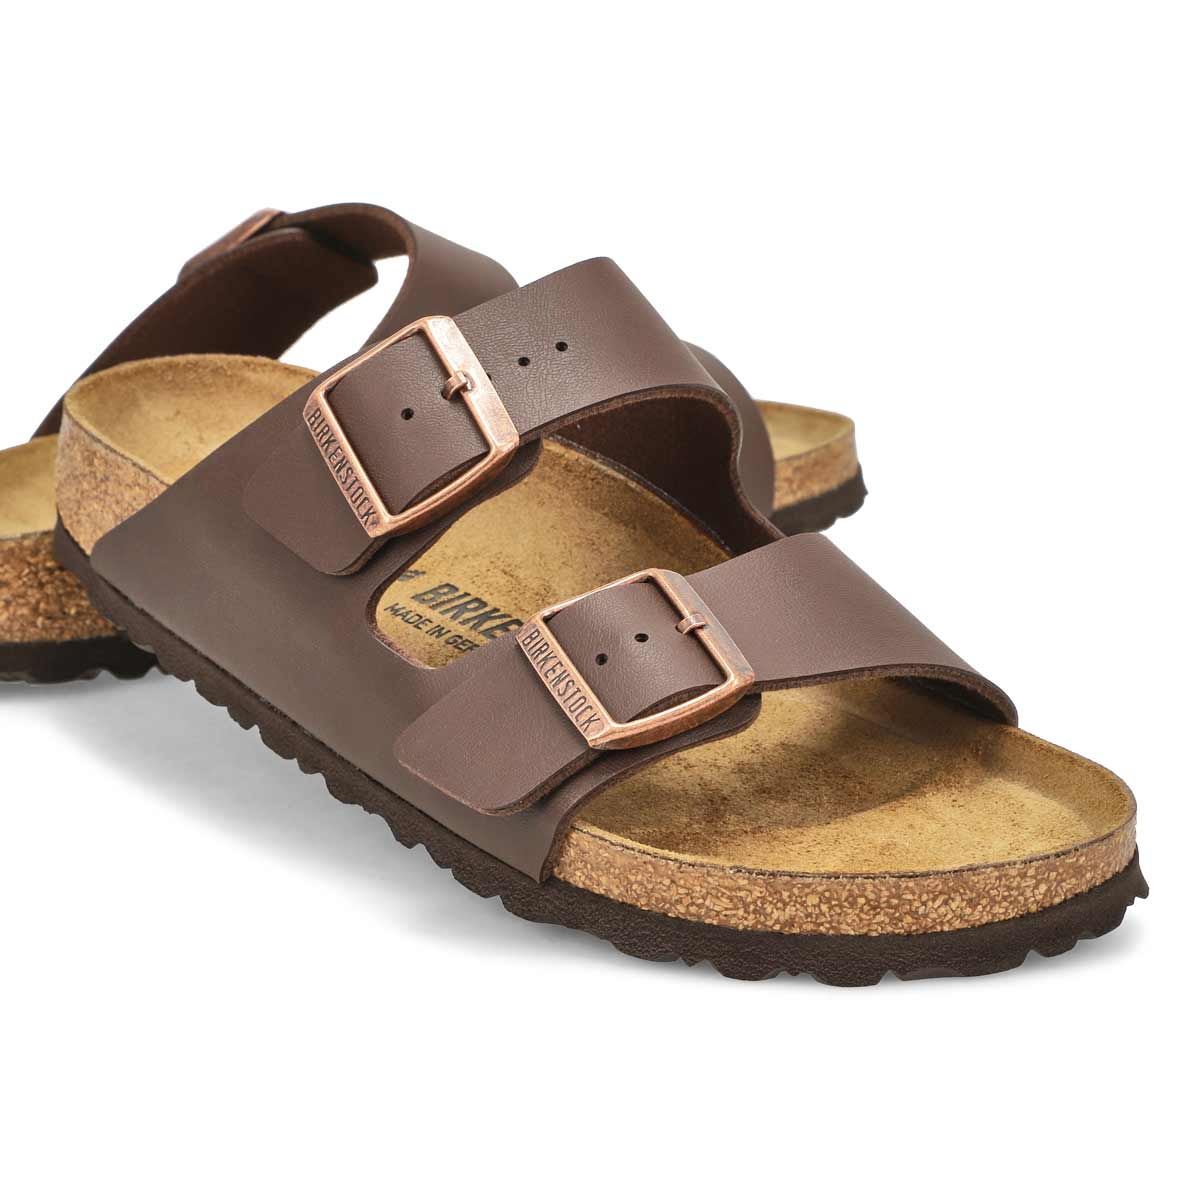 Sandale Arizona, modèle étroit,brun, fem